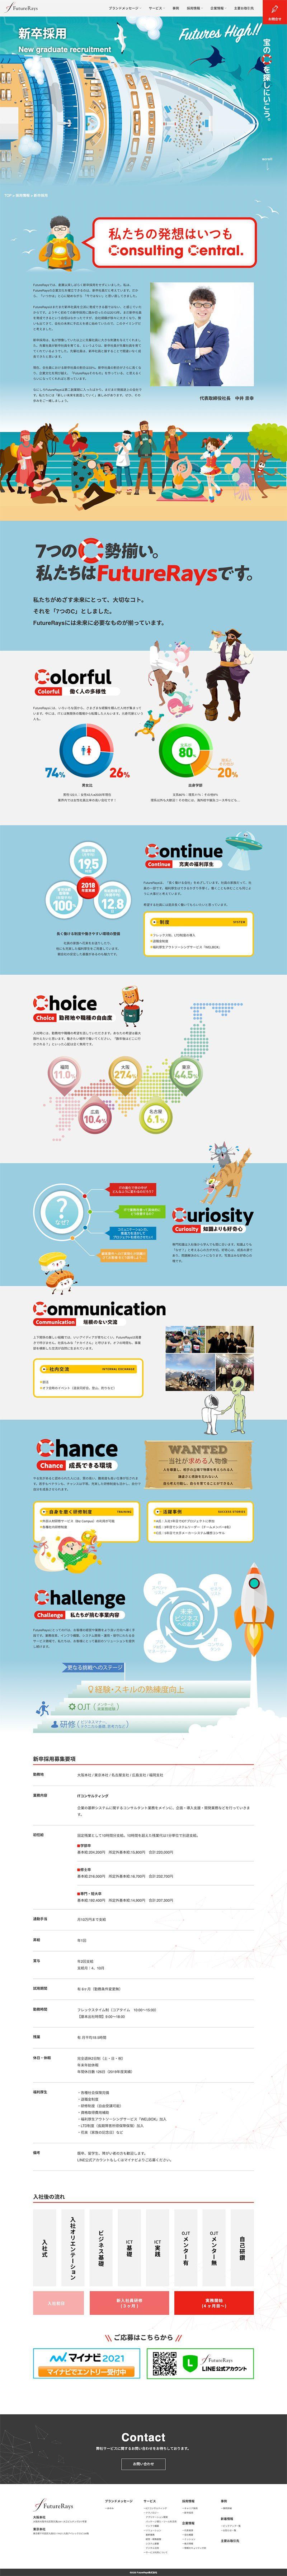 FutureRays株式会社様|コーポレートサイト/採用情報